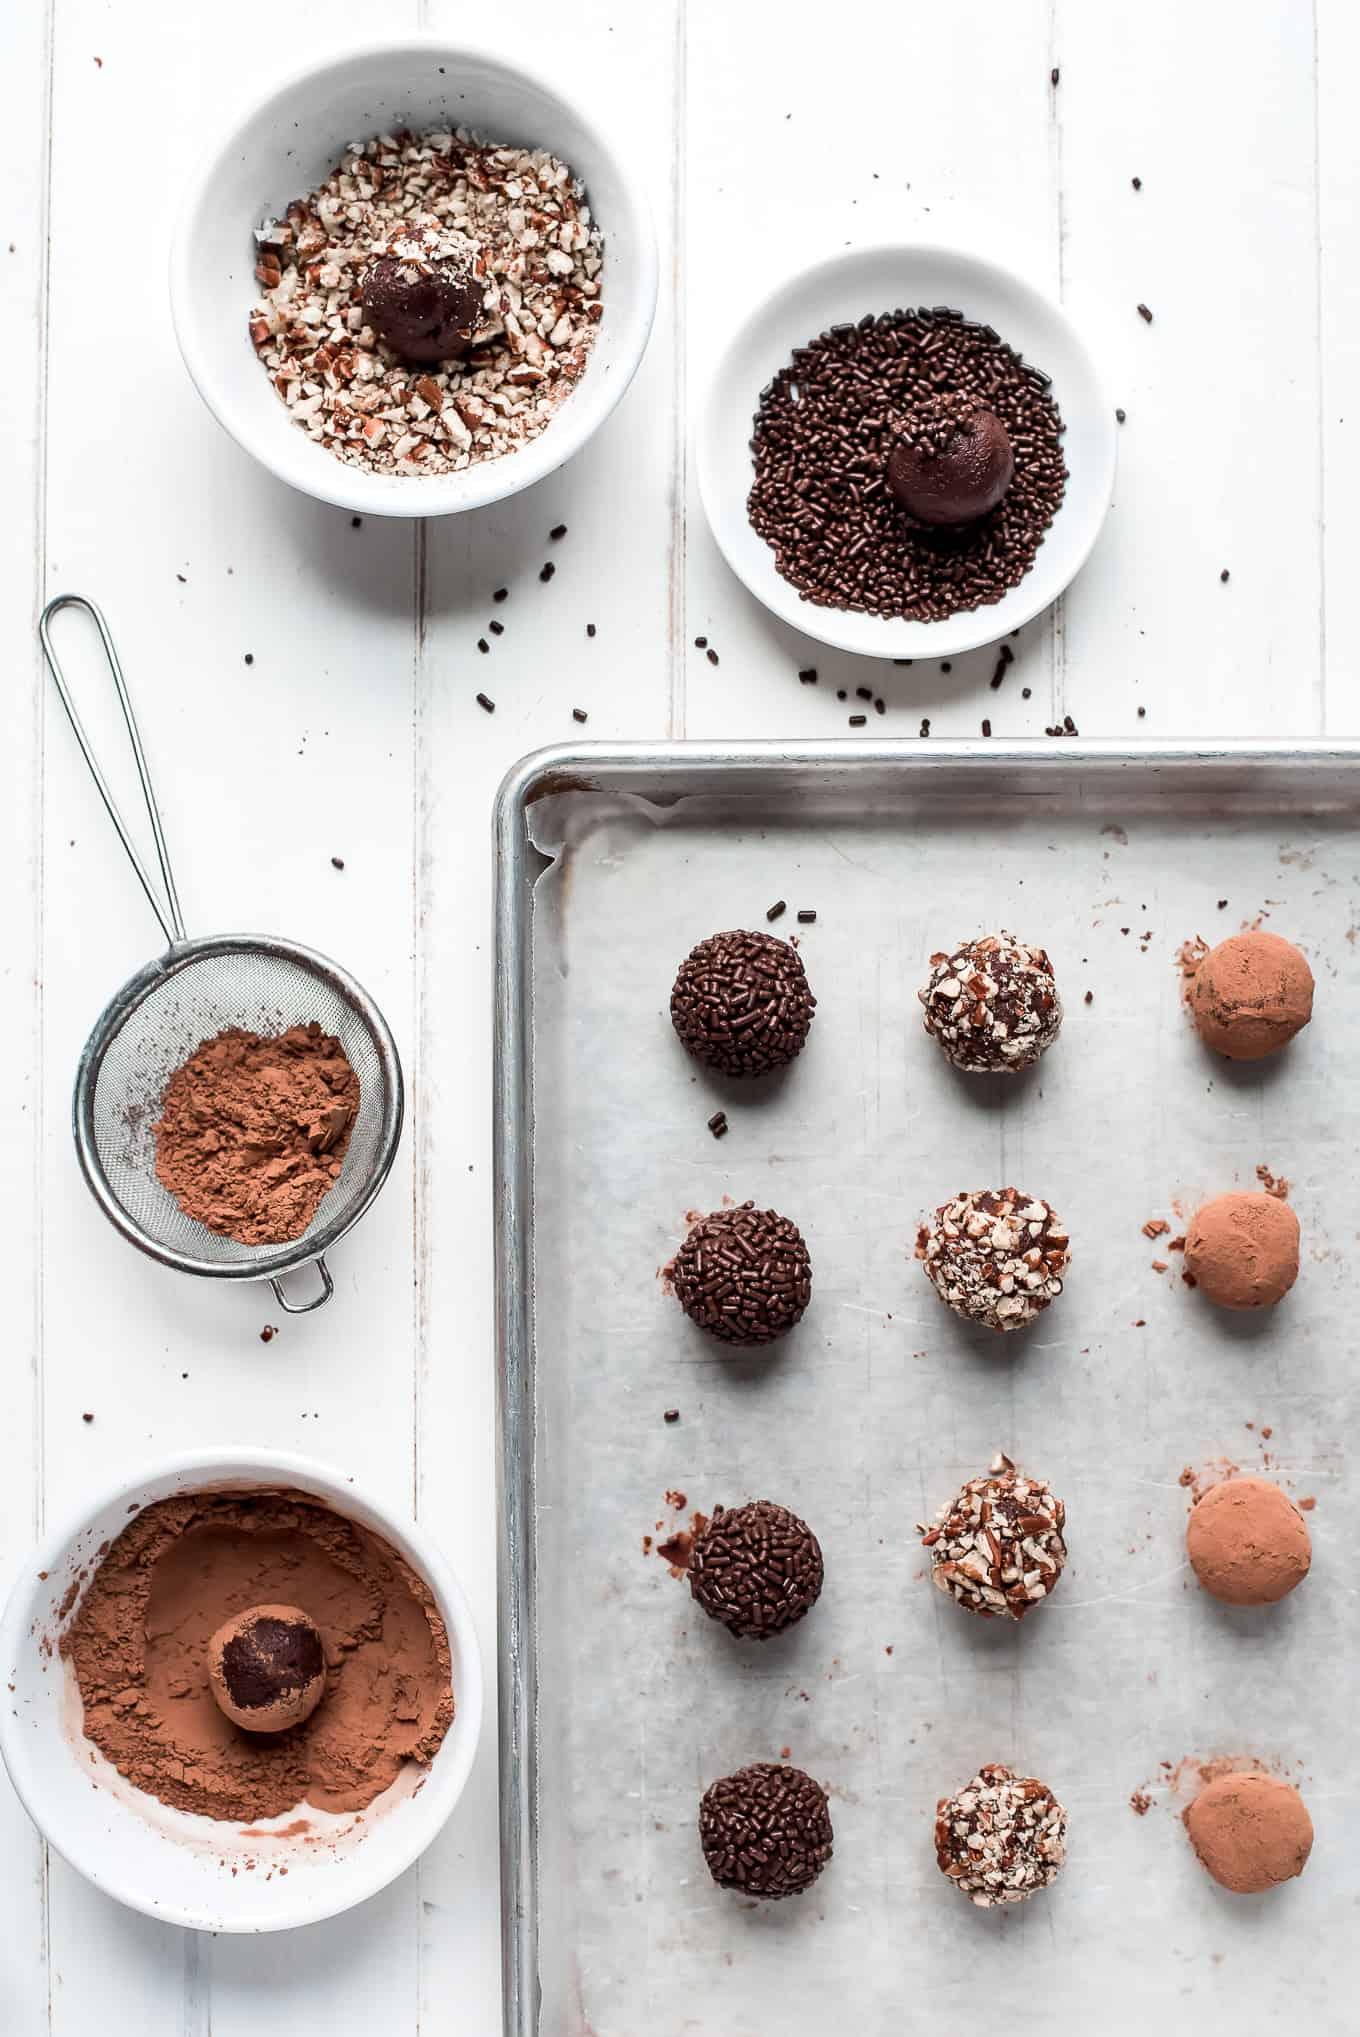 4-Ingredient Chocolate Truffles